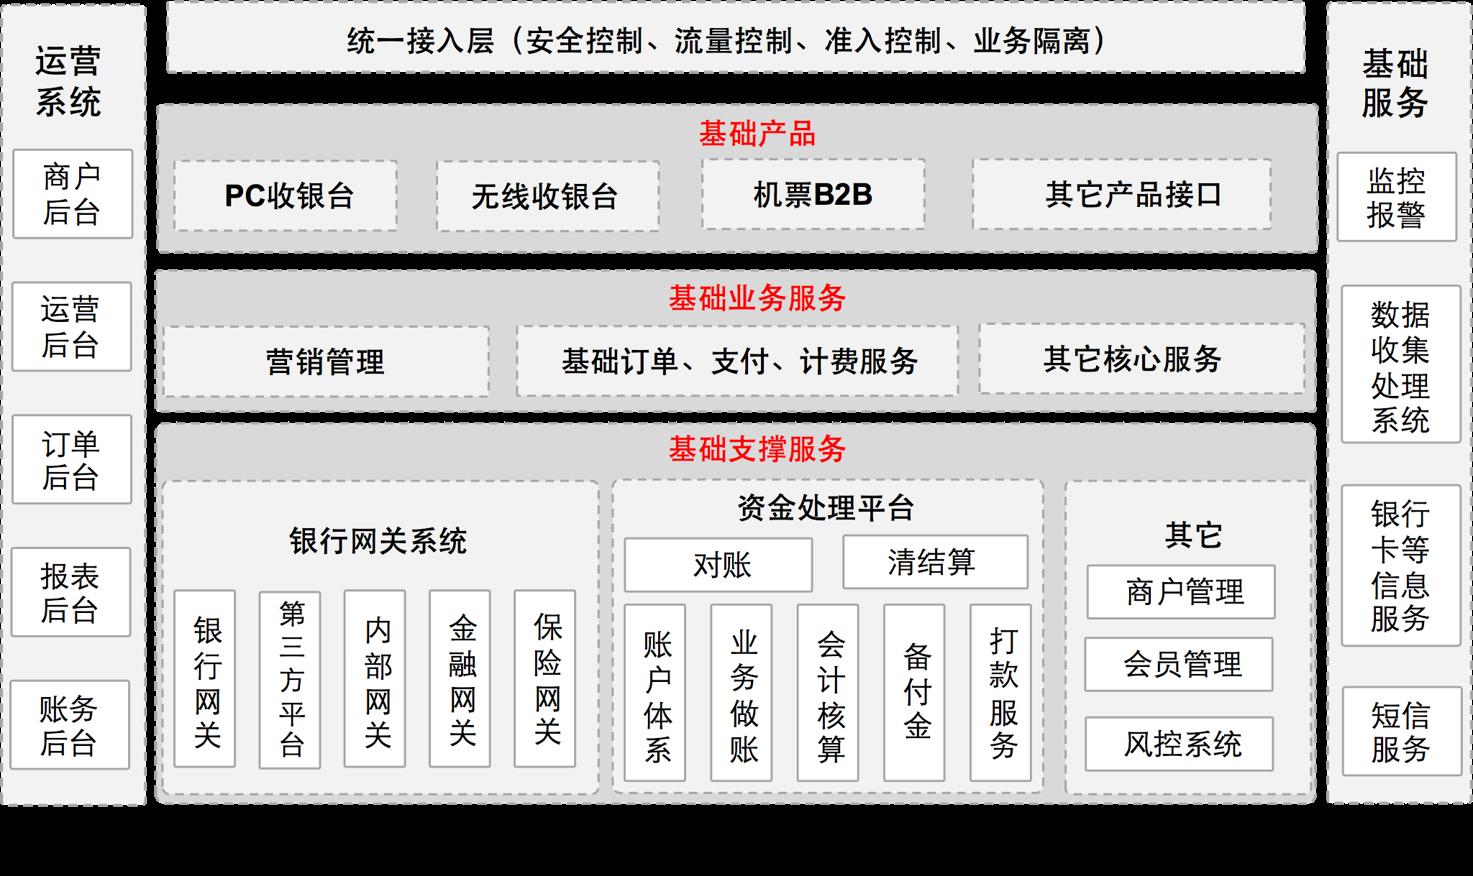 Q旅游公司产品架构